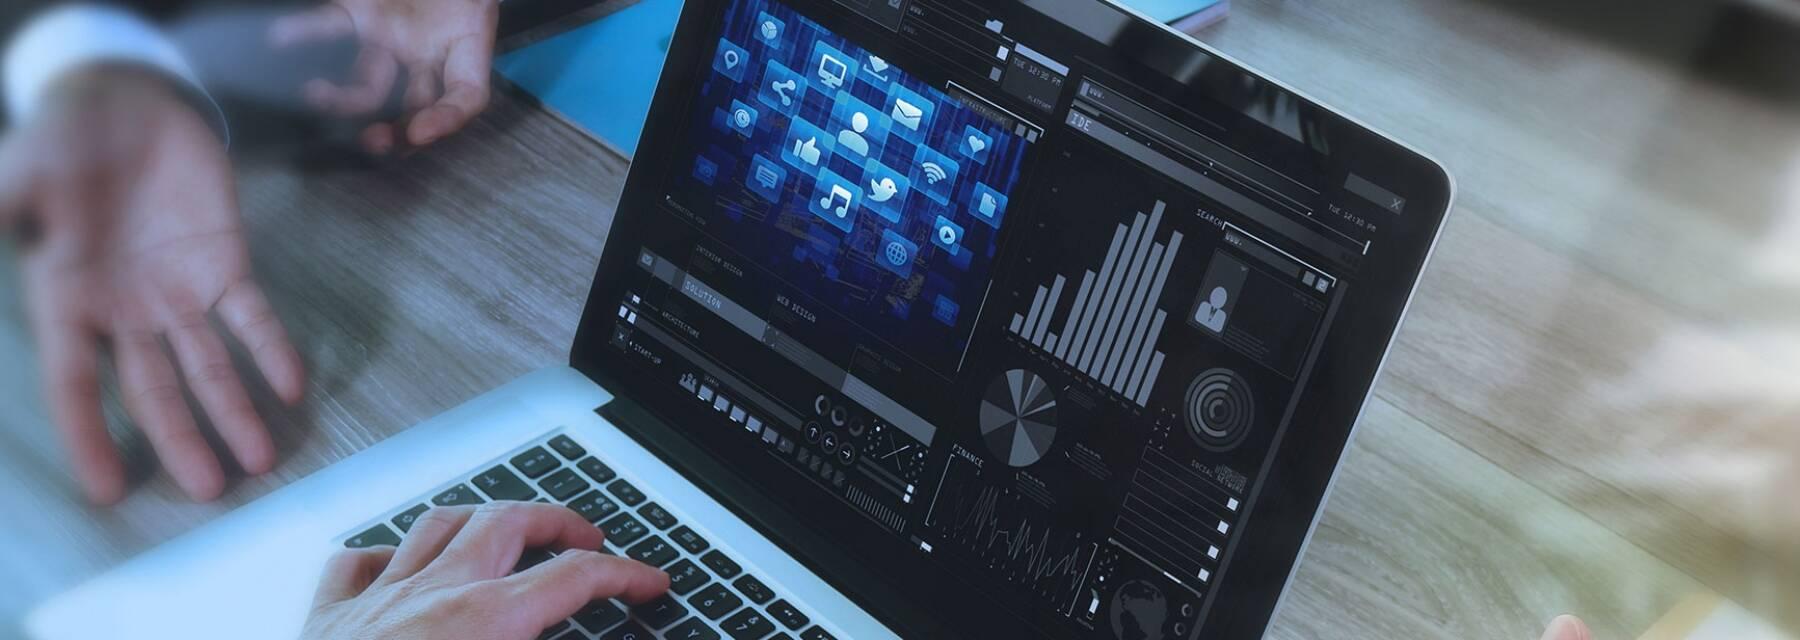 social-media-analysis-service